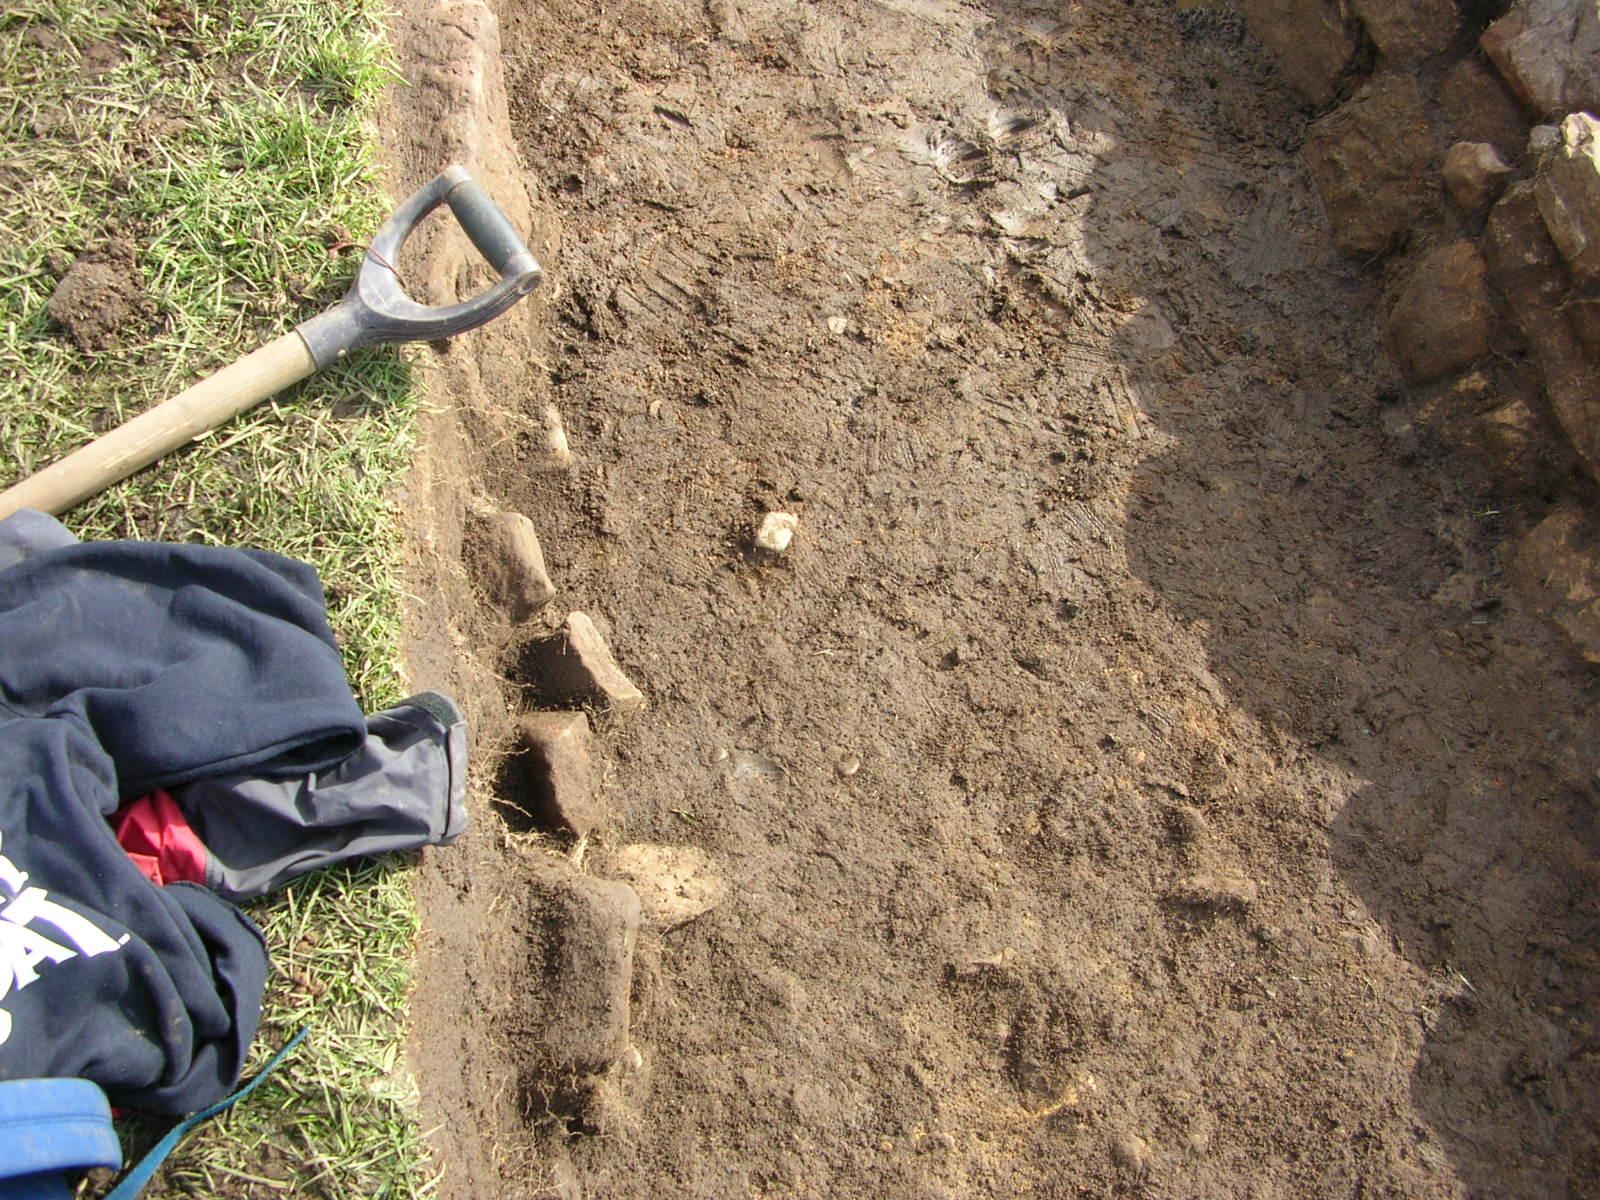 Vindolanda_2012_075.jpg